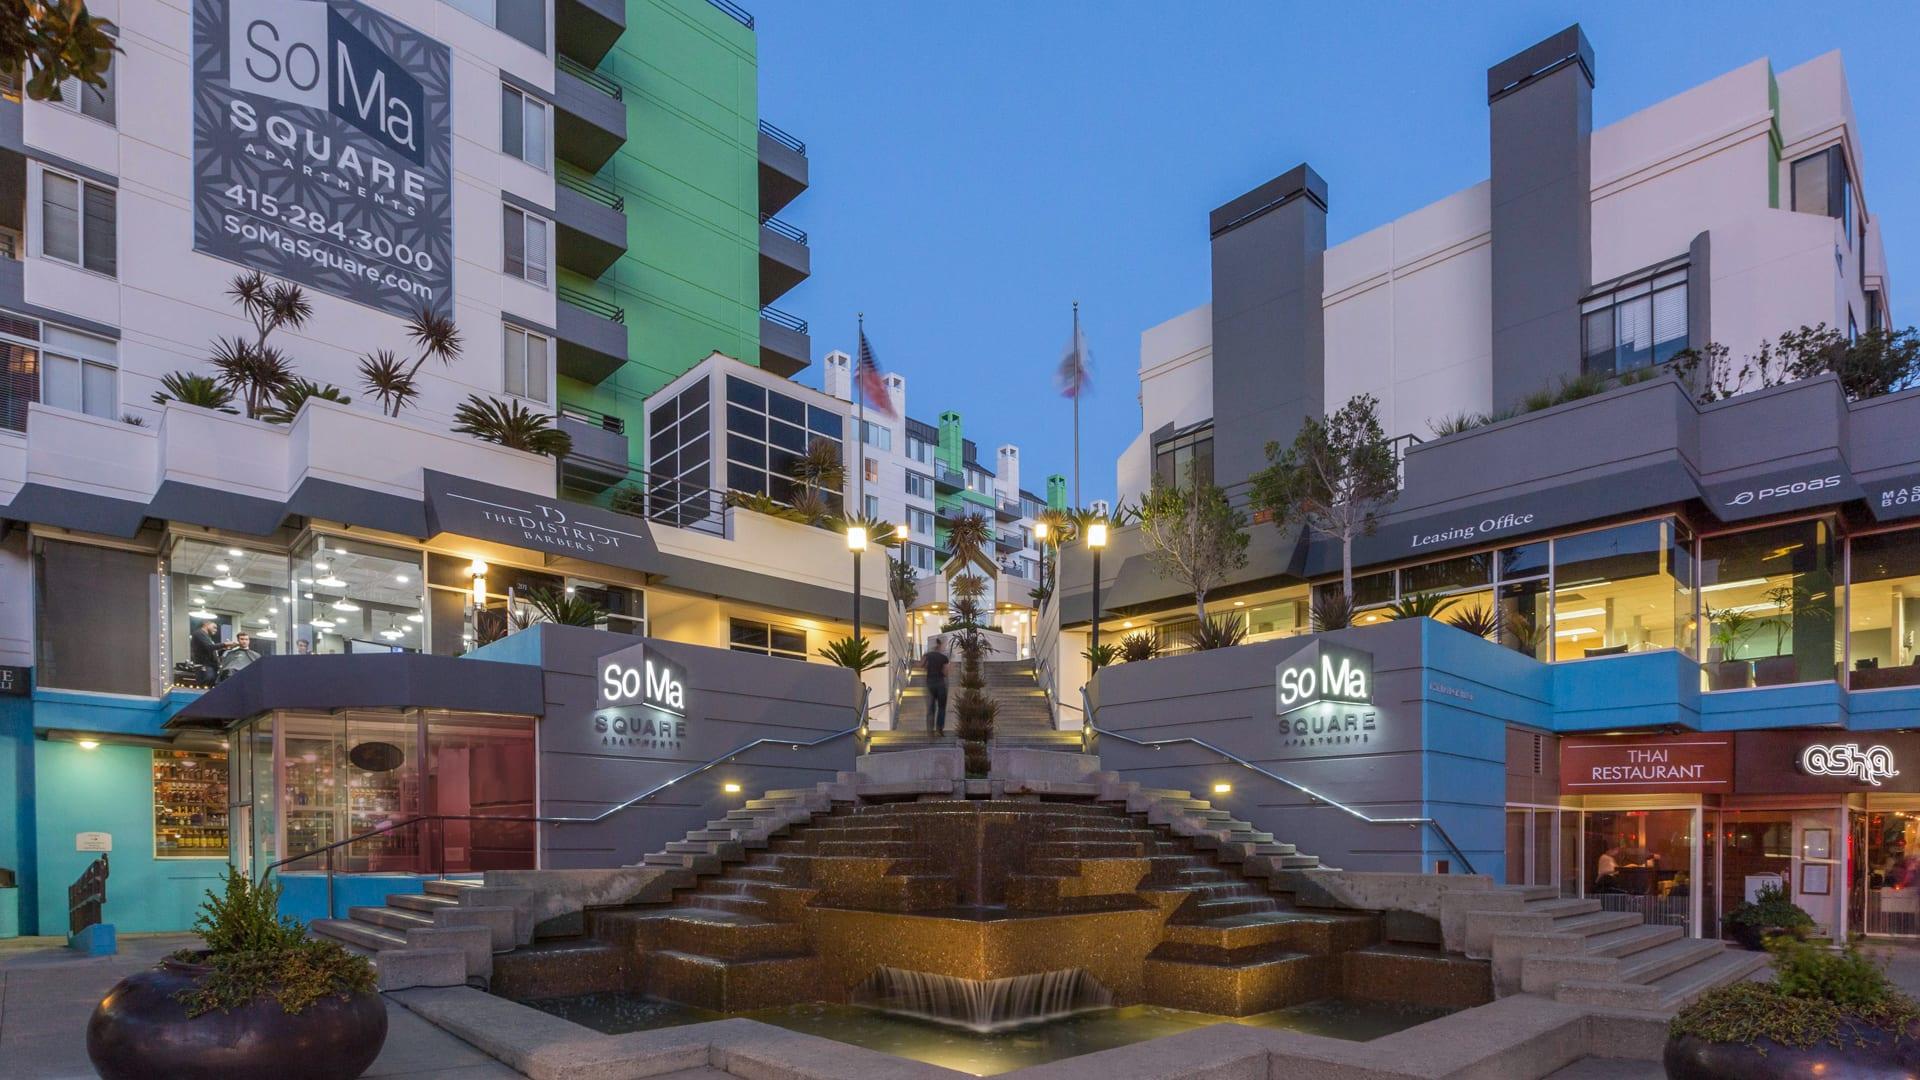 SoMa Square Apartments